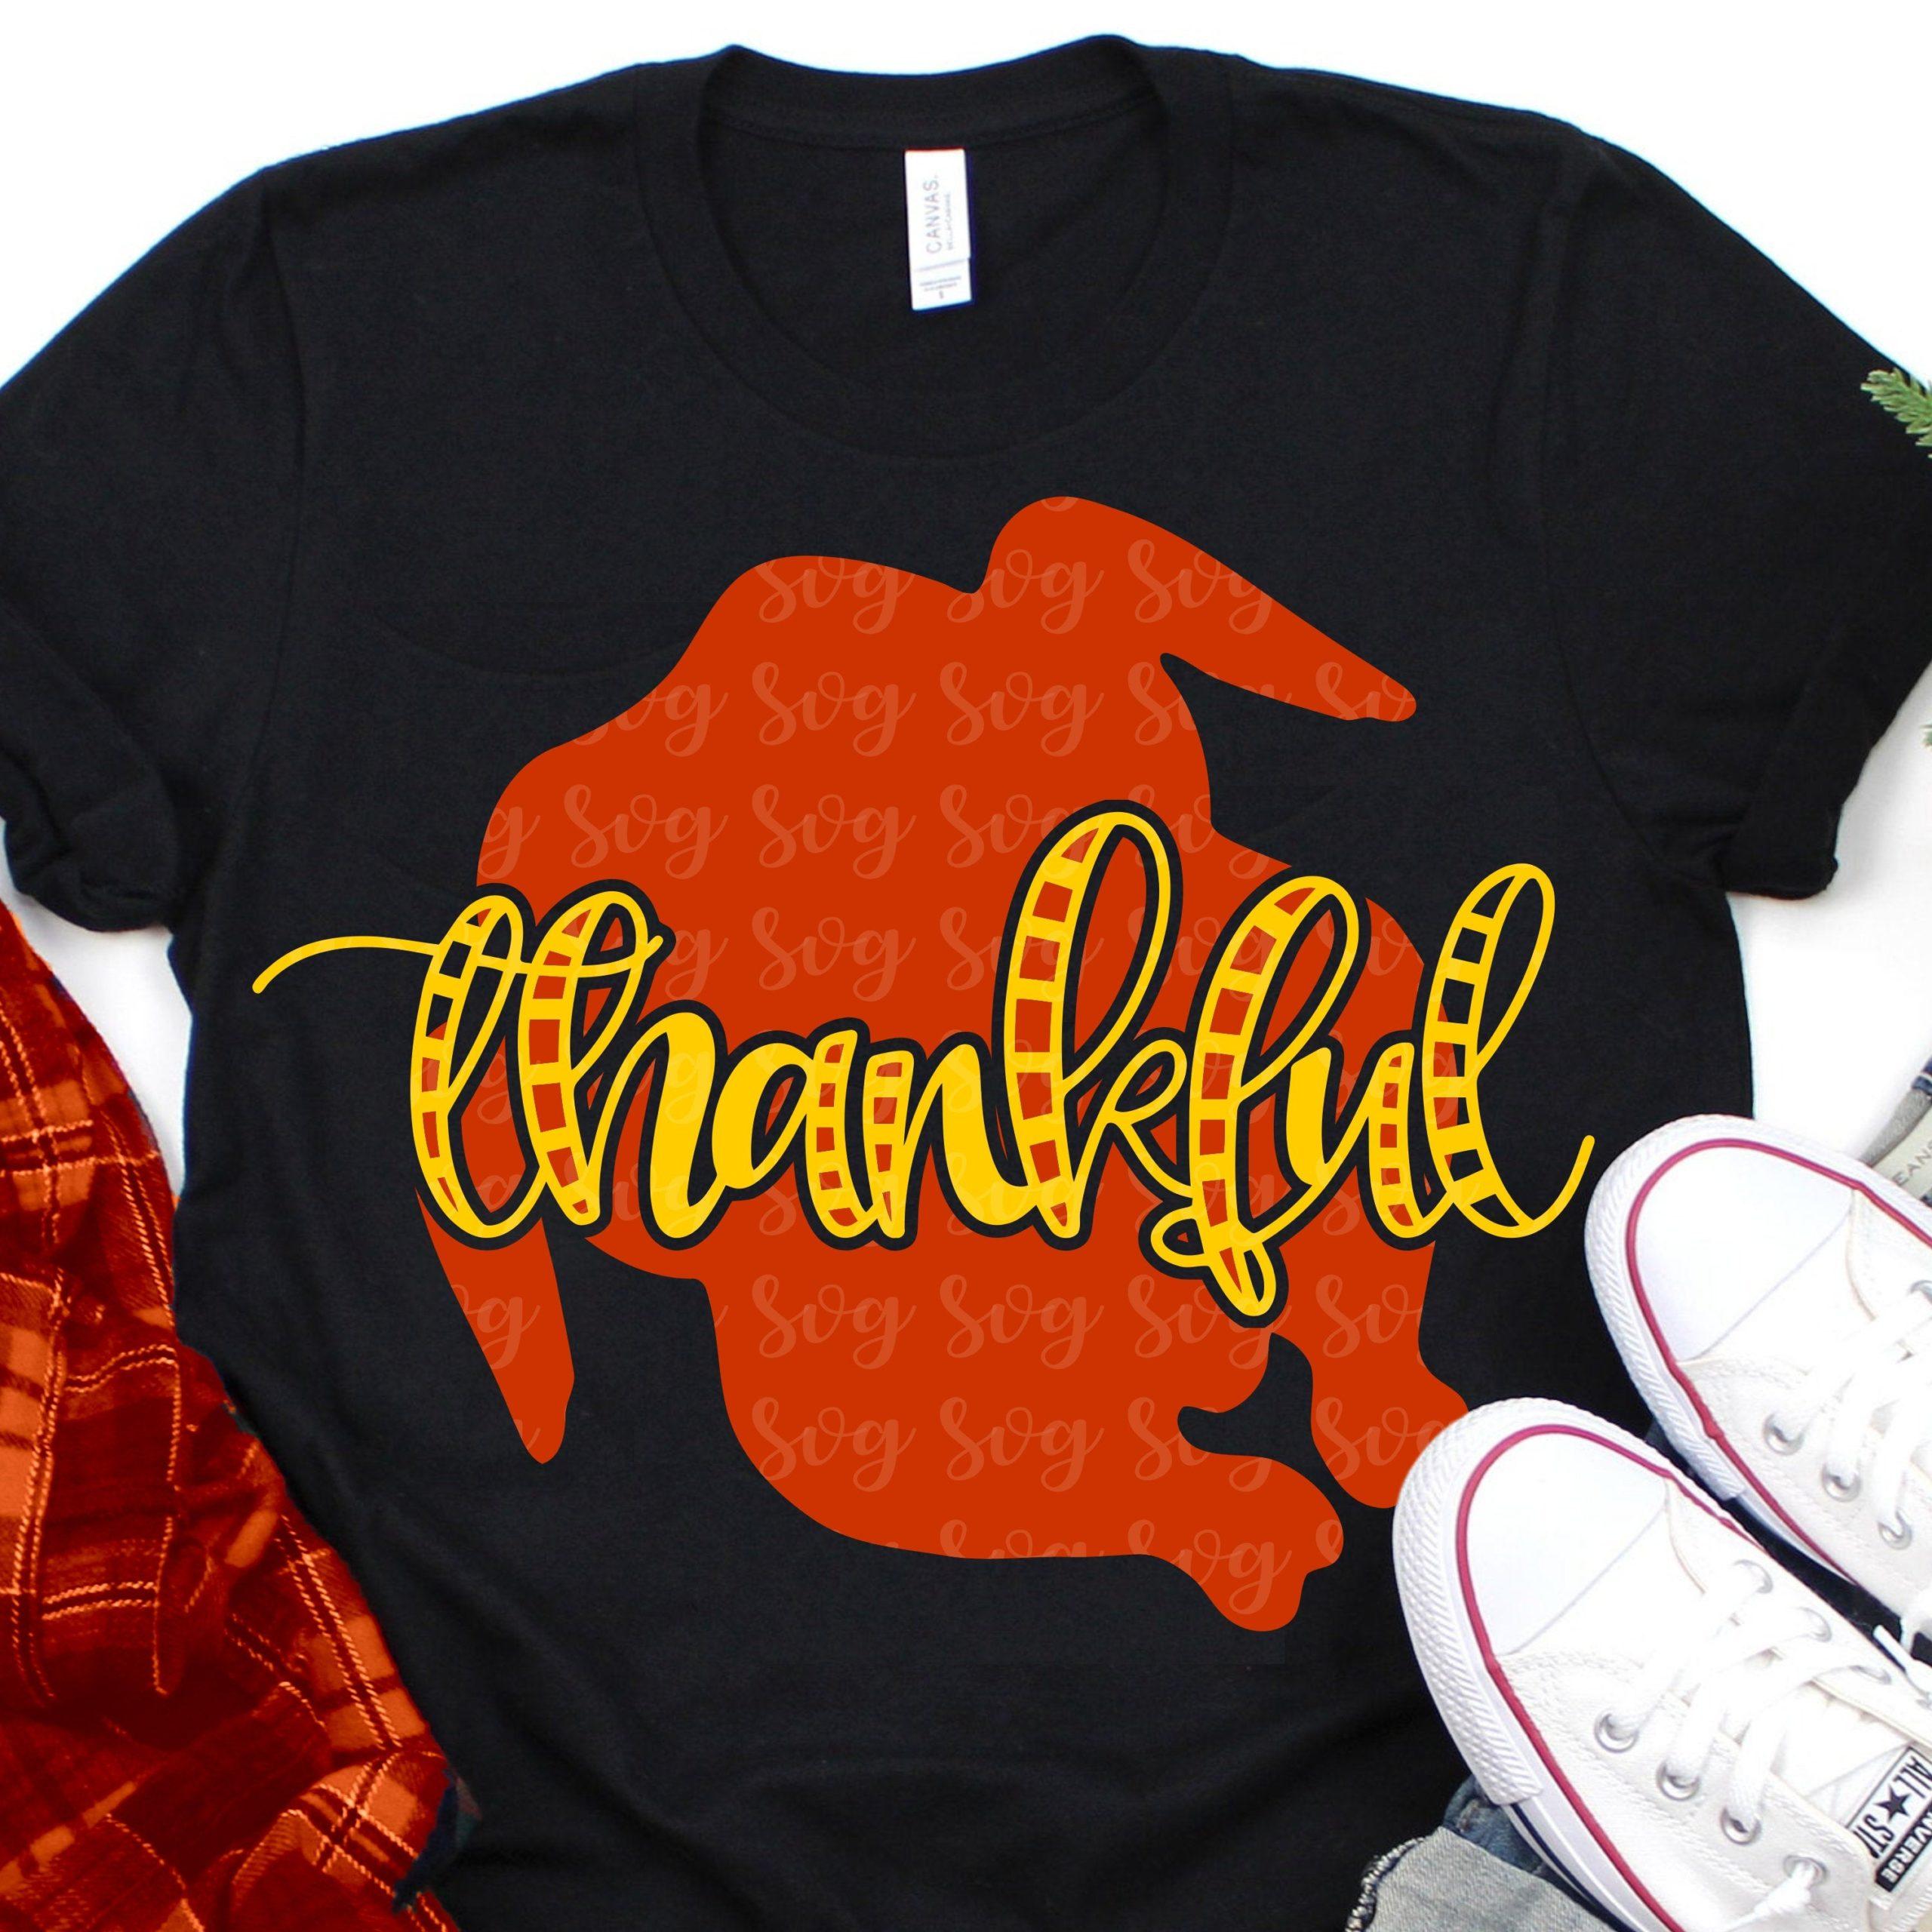 Thankful-turkey-svg-thankful-svg-fall-svg-thankful-blessed-svg-thanksgiving-svg-svgdigital-downloaddxf-eps-svg-for-cricut-5f721b47